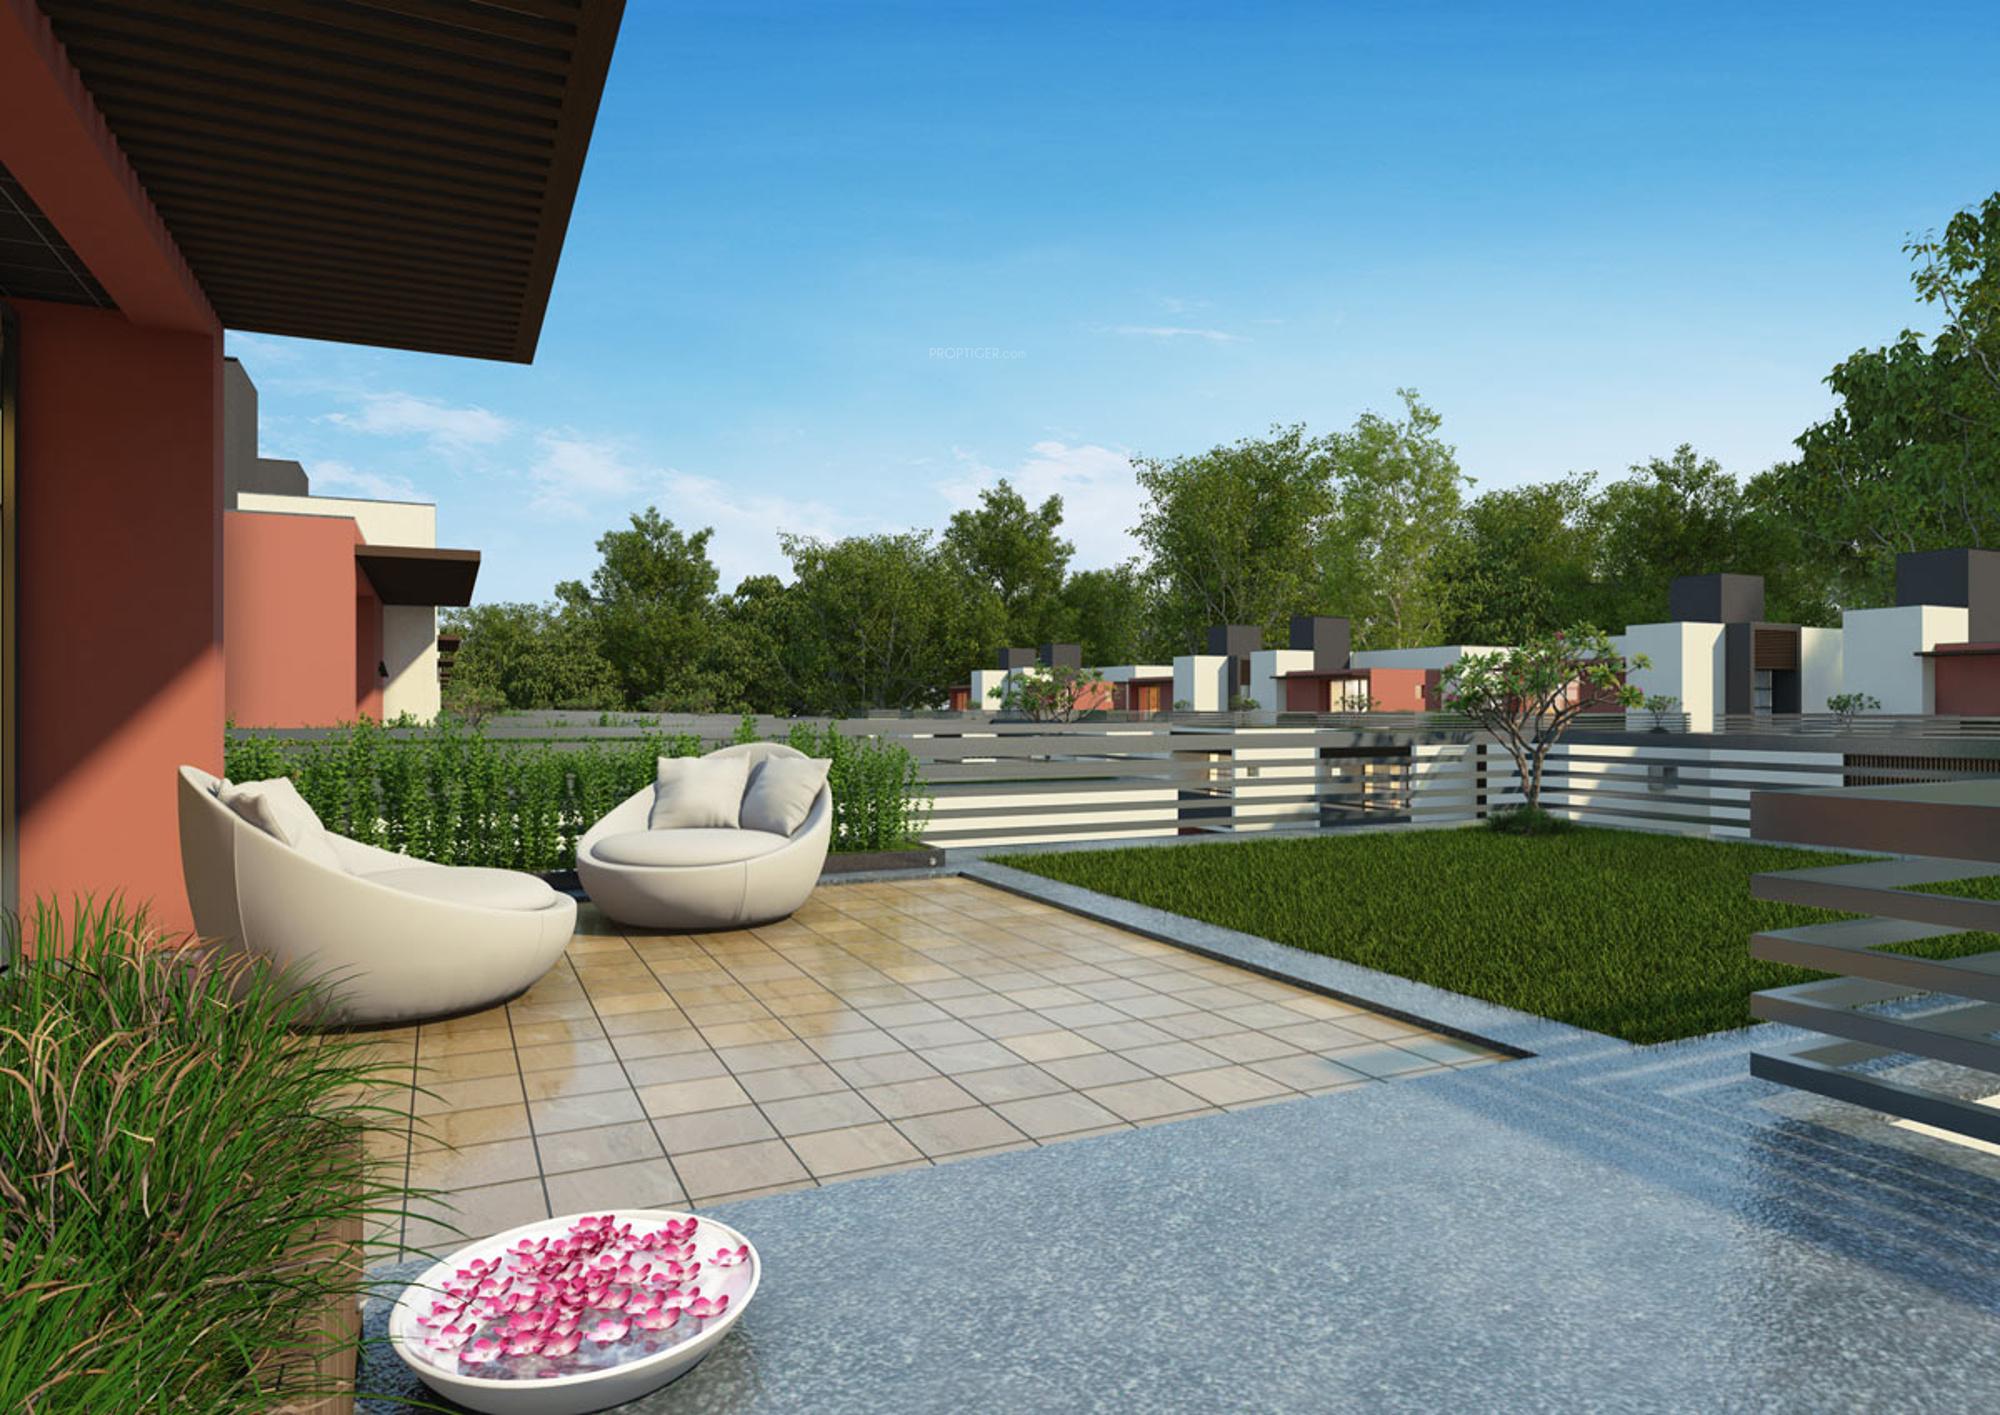 6399 sq ft 4 bhk 4t villa for sale in goyal and co hariyana group vernis shela ahmedabad. Black Bedroom Furniture Sets. Home Design Ideas